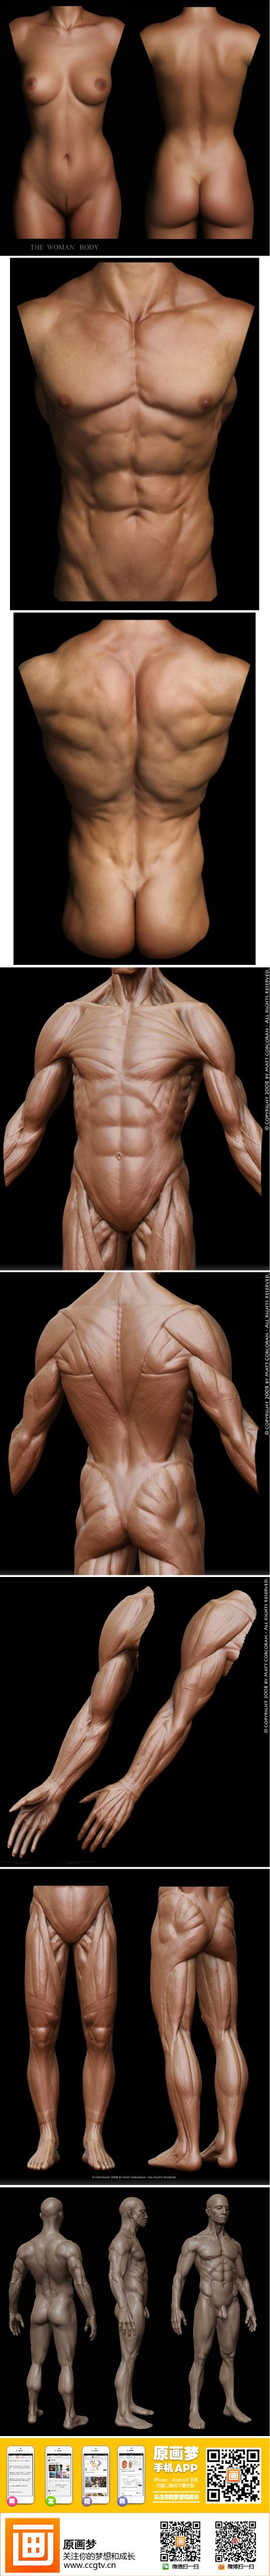 CG硬克美术资源网的微博|新浪微博-随时...@莫须有的猫采集到人体结构,肌肉参考(64图)_花瓣游戏